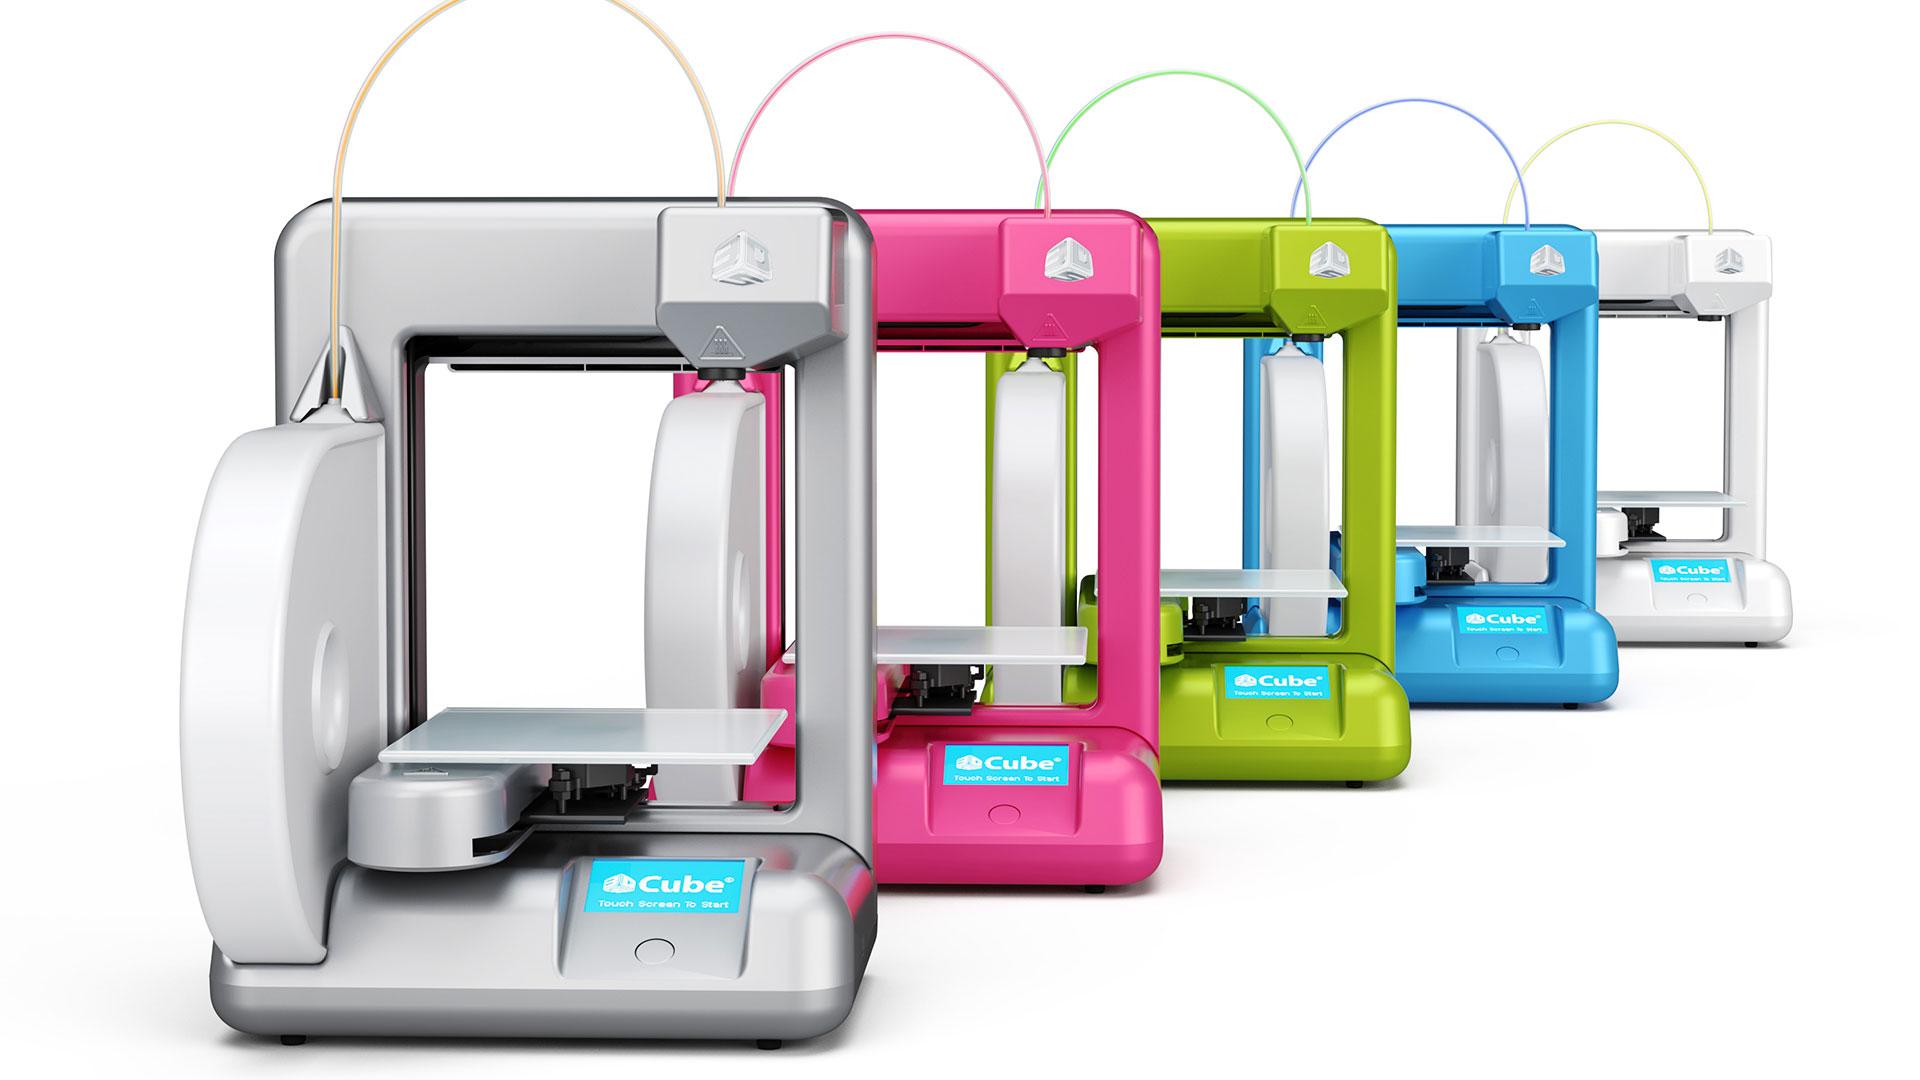 Impresoras en 3D hero asset